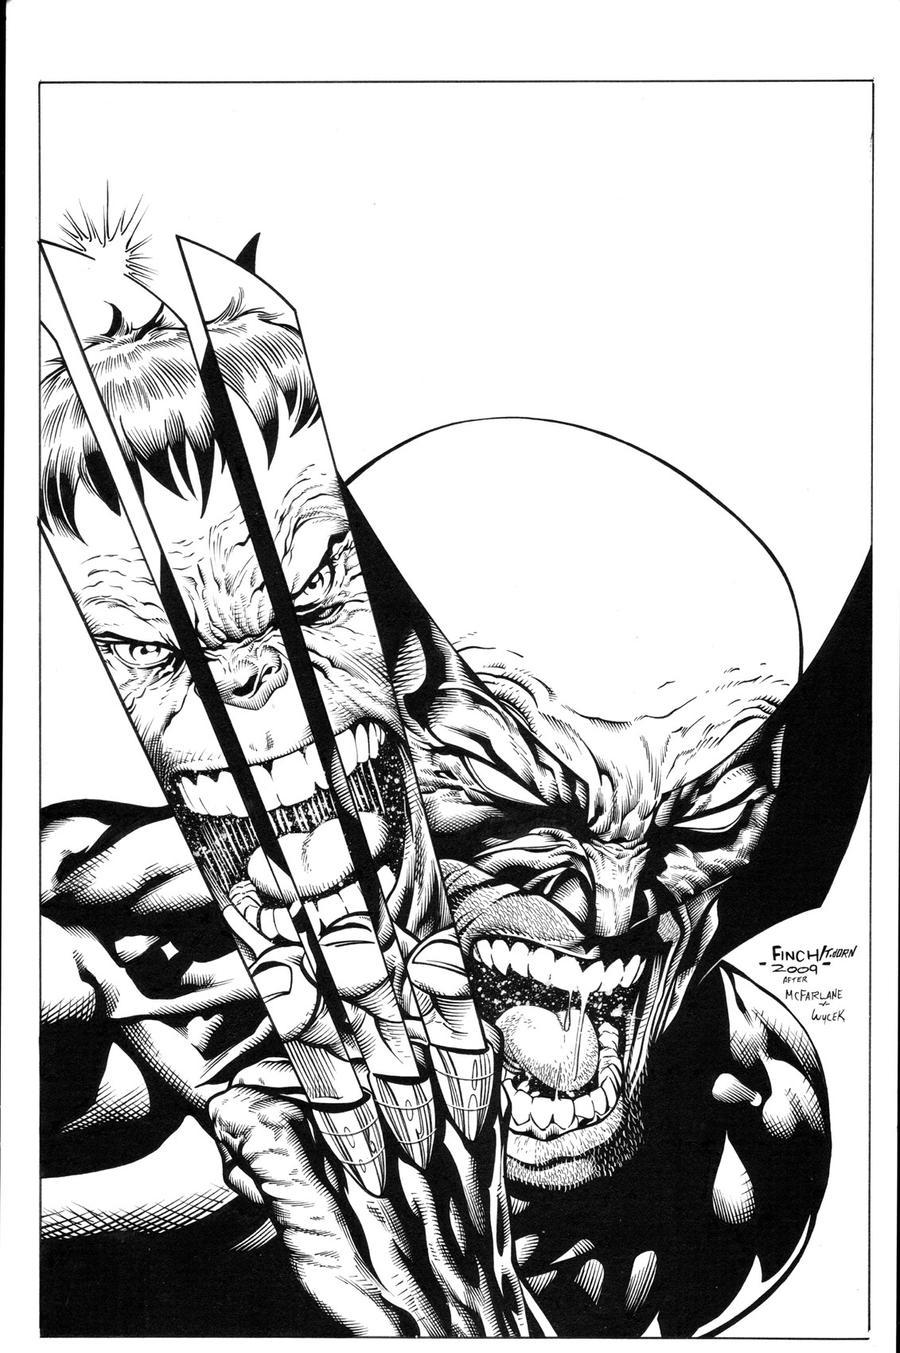 Hulk Wolverine Homage inks by madman1